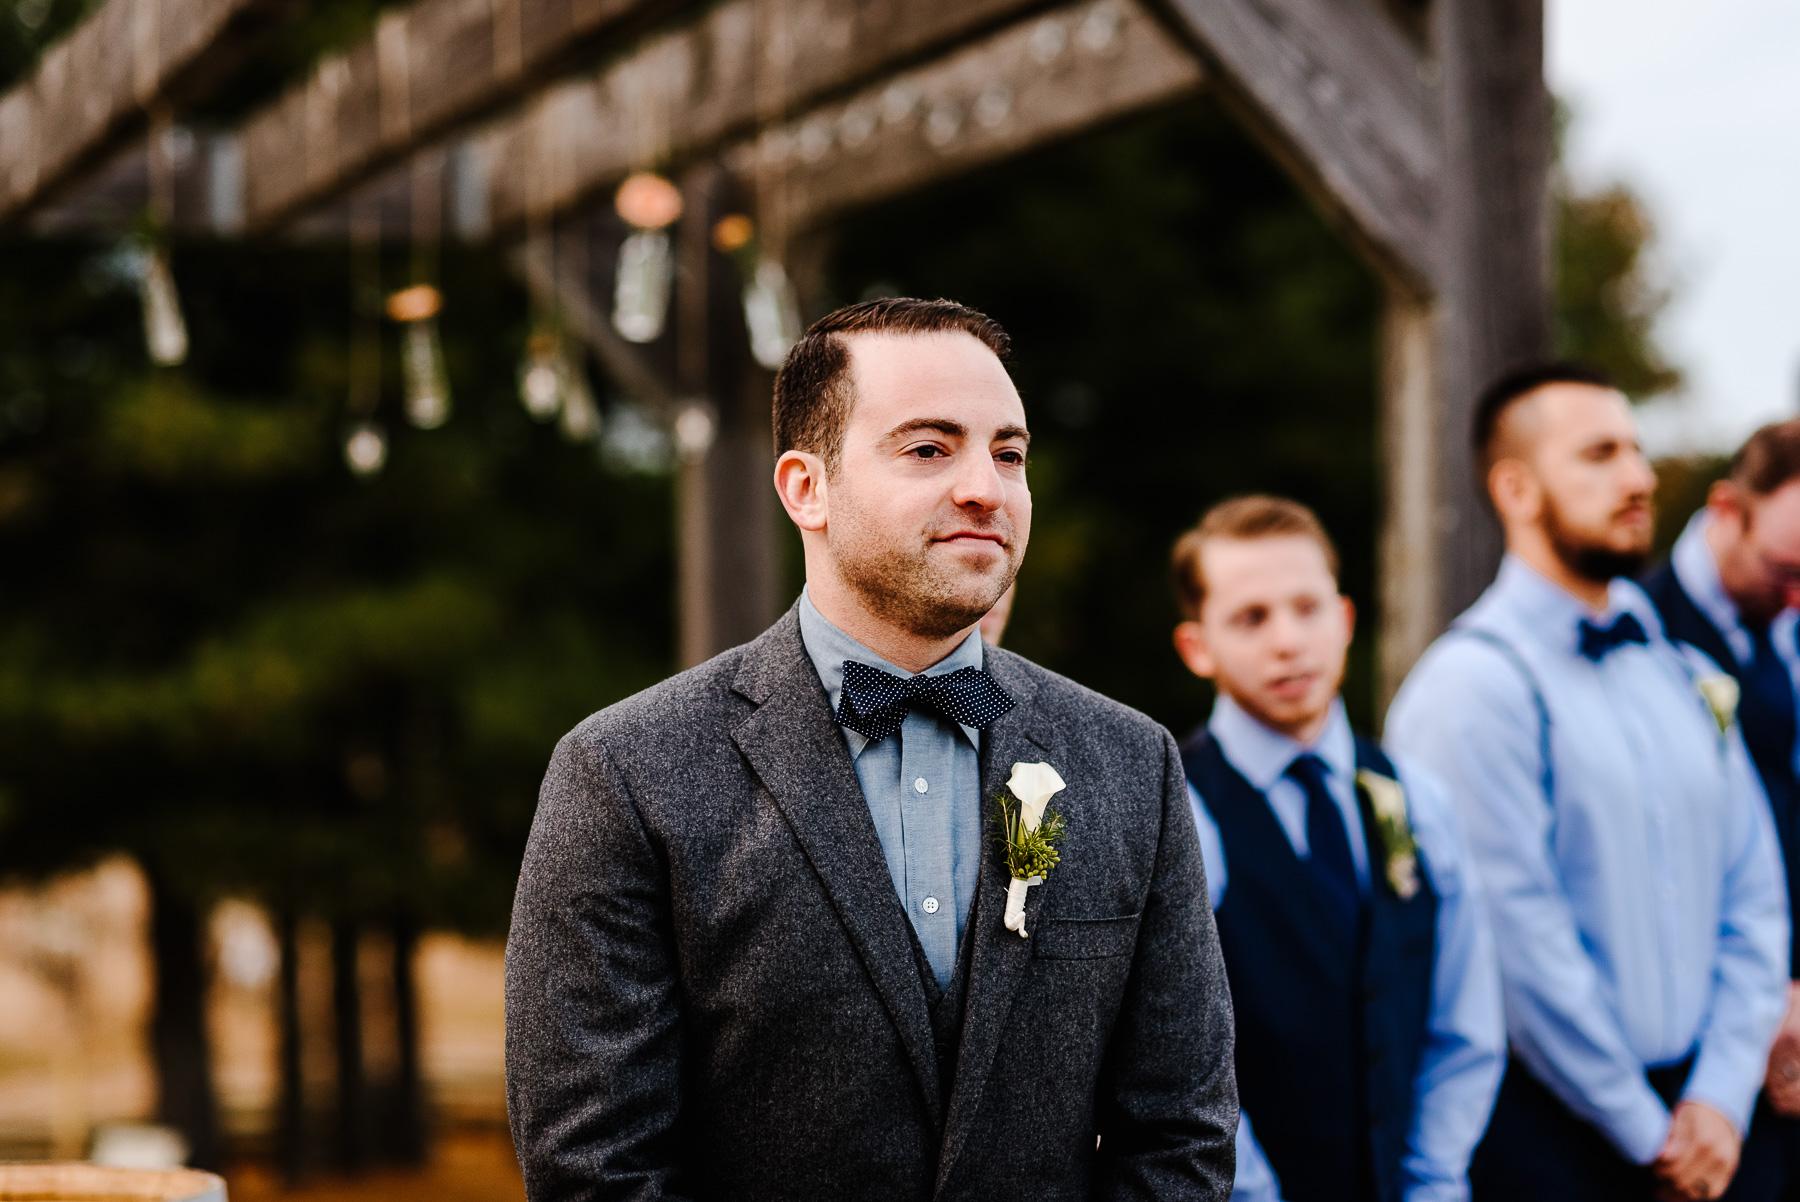 74-Laurita Winery Wedding New Jersey Wedding Photographer Laurita Winery Weddings Longbrook Photography.jpg